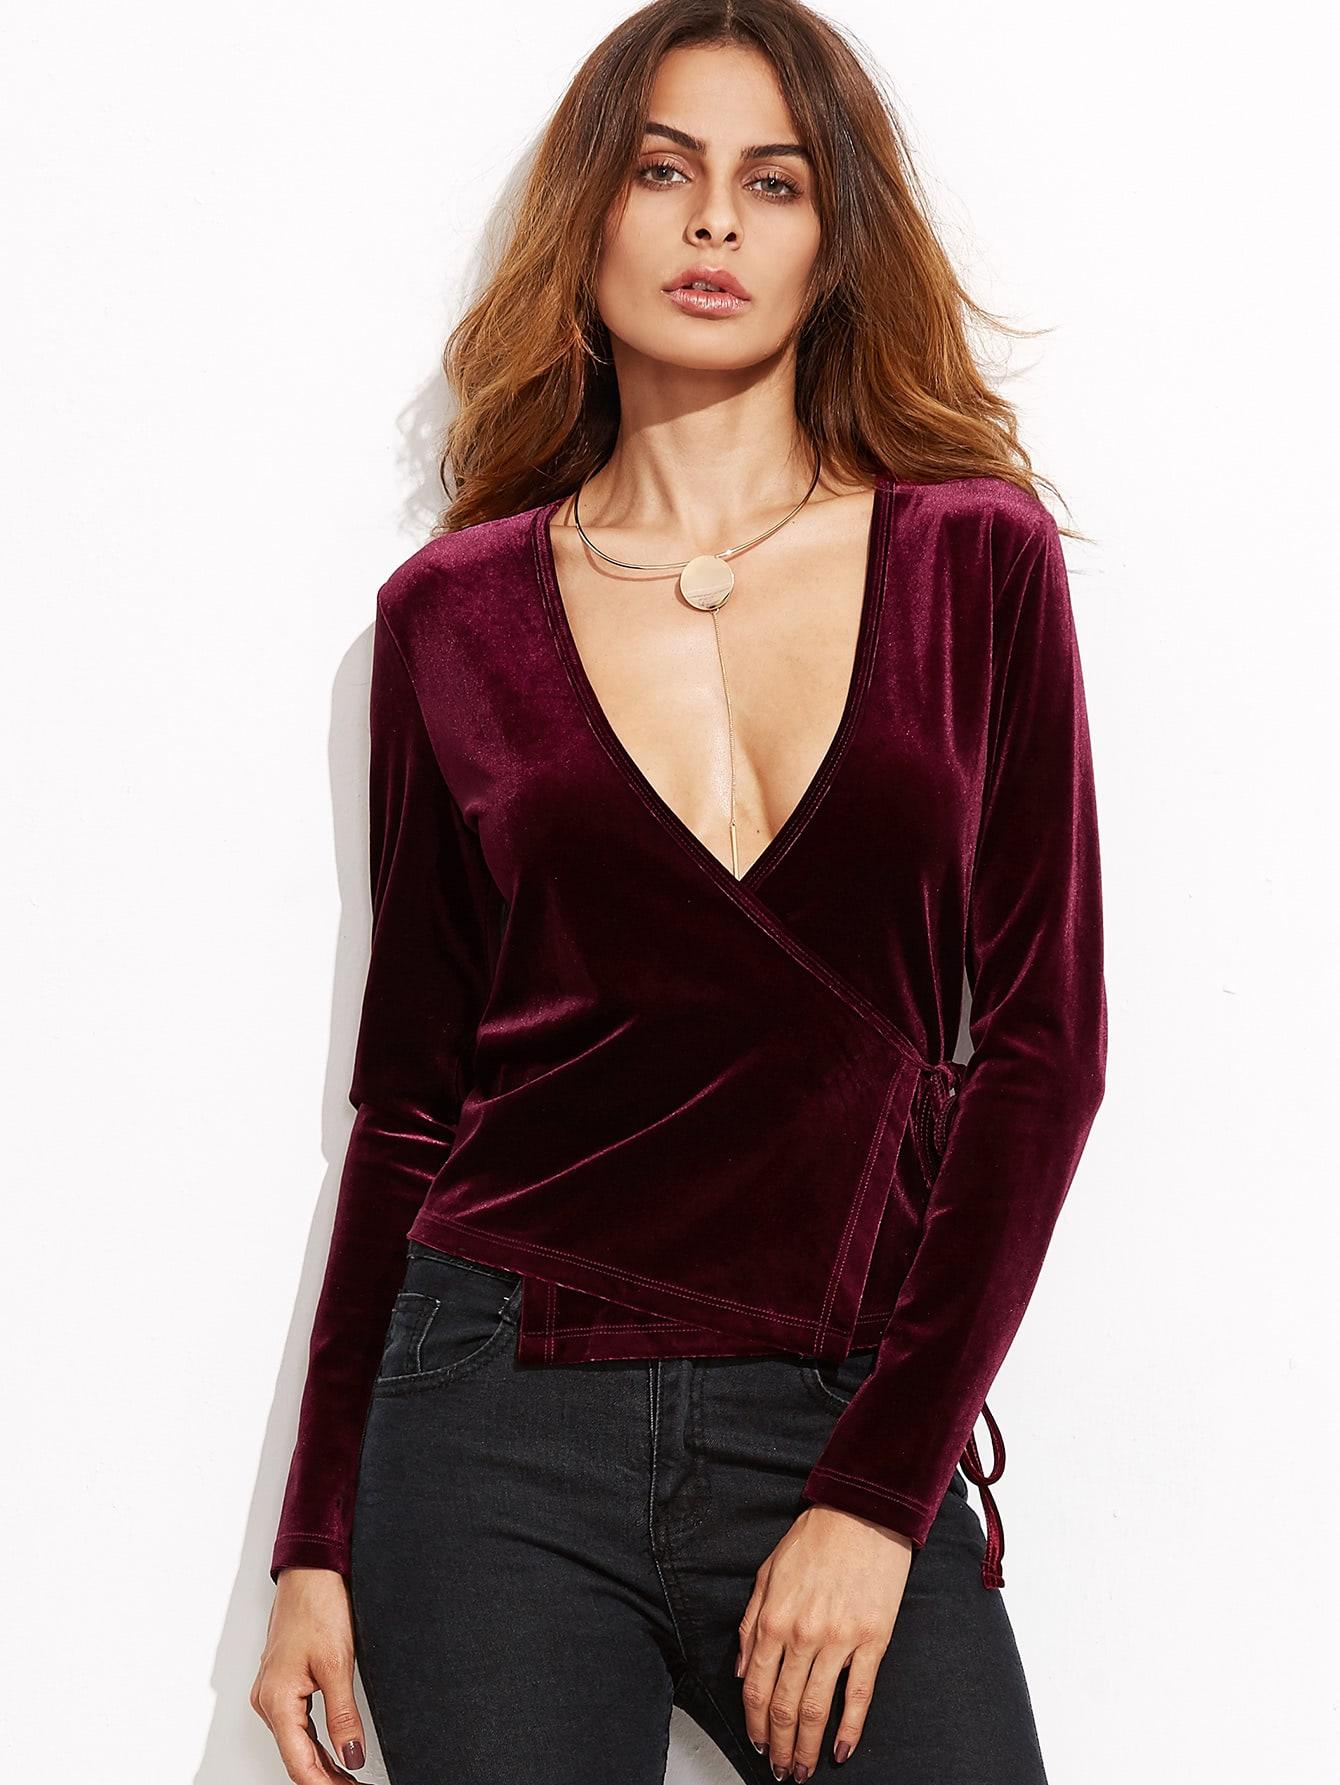 Блузка Из Бархата Доставка